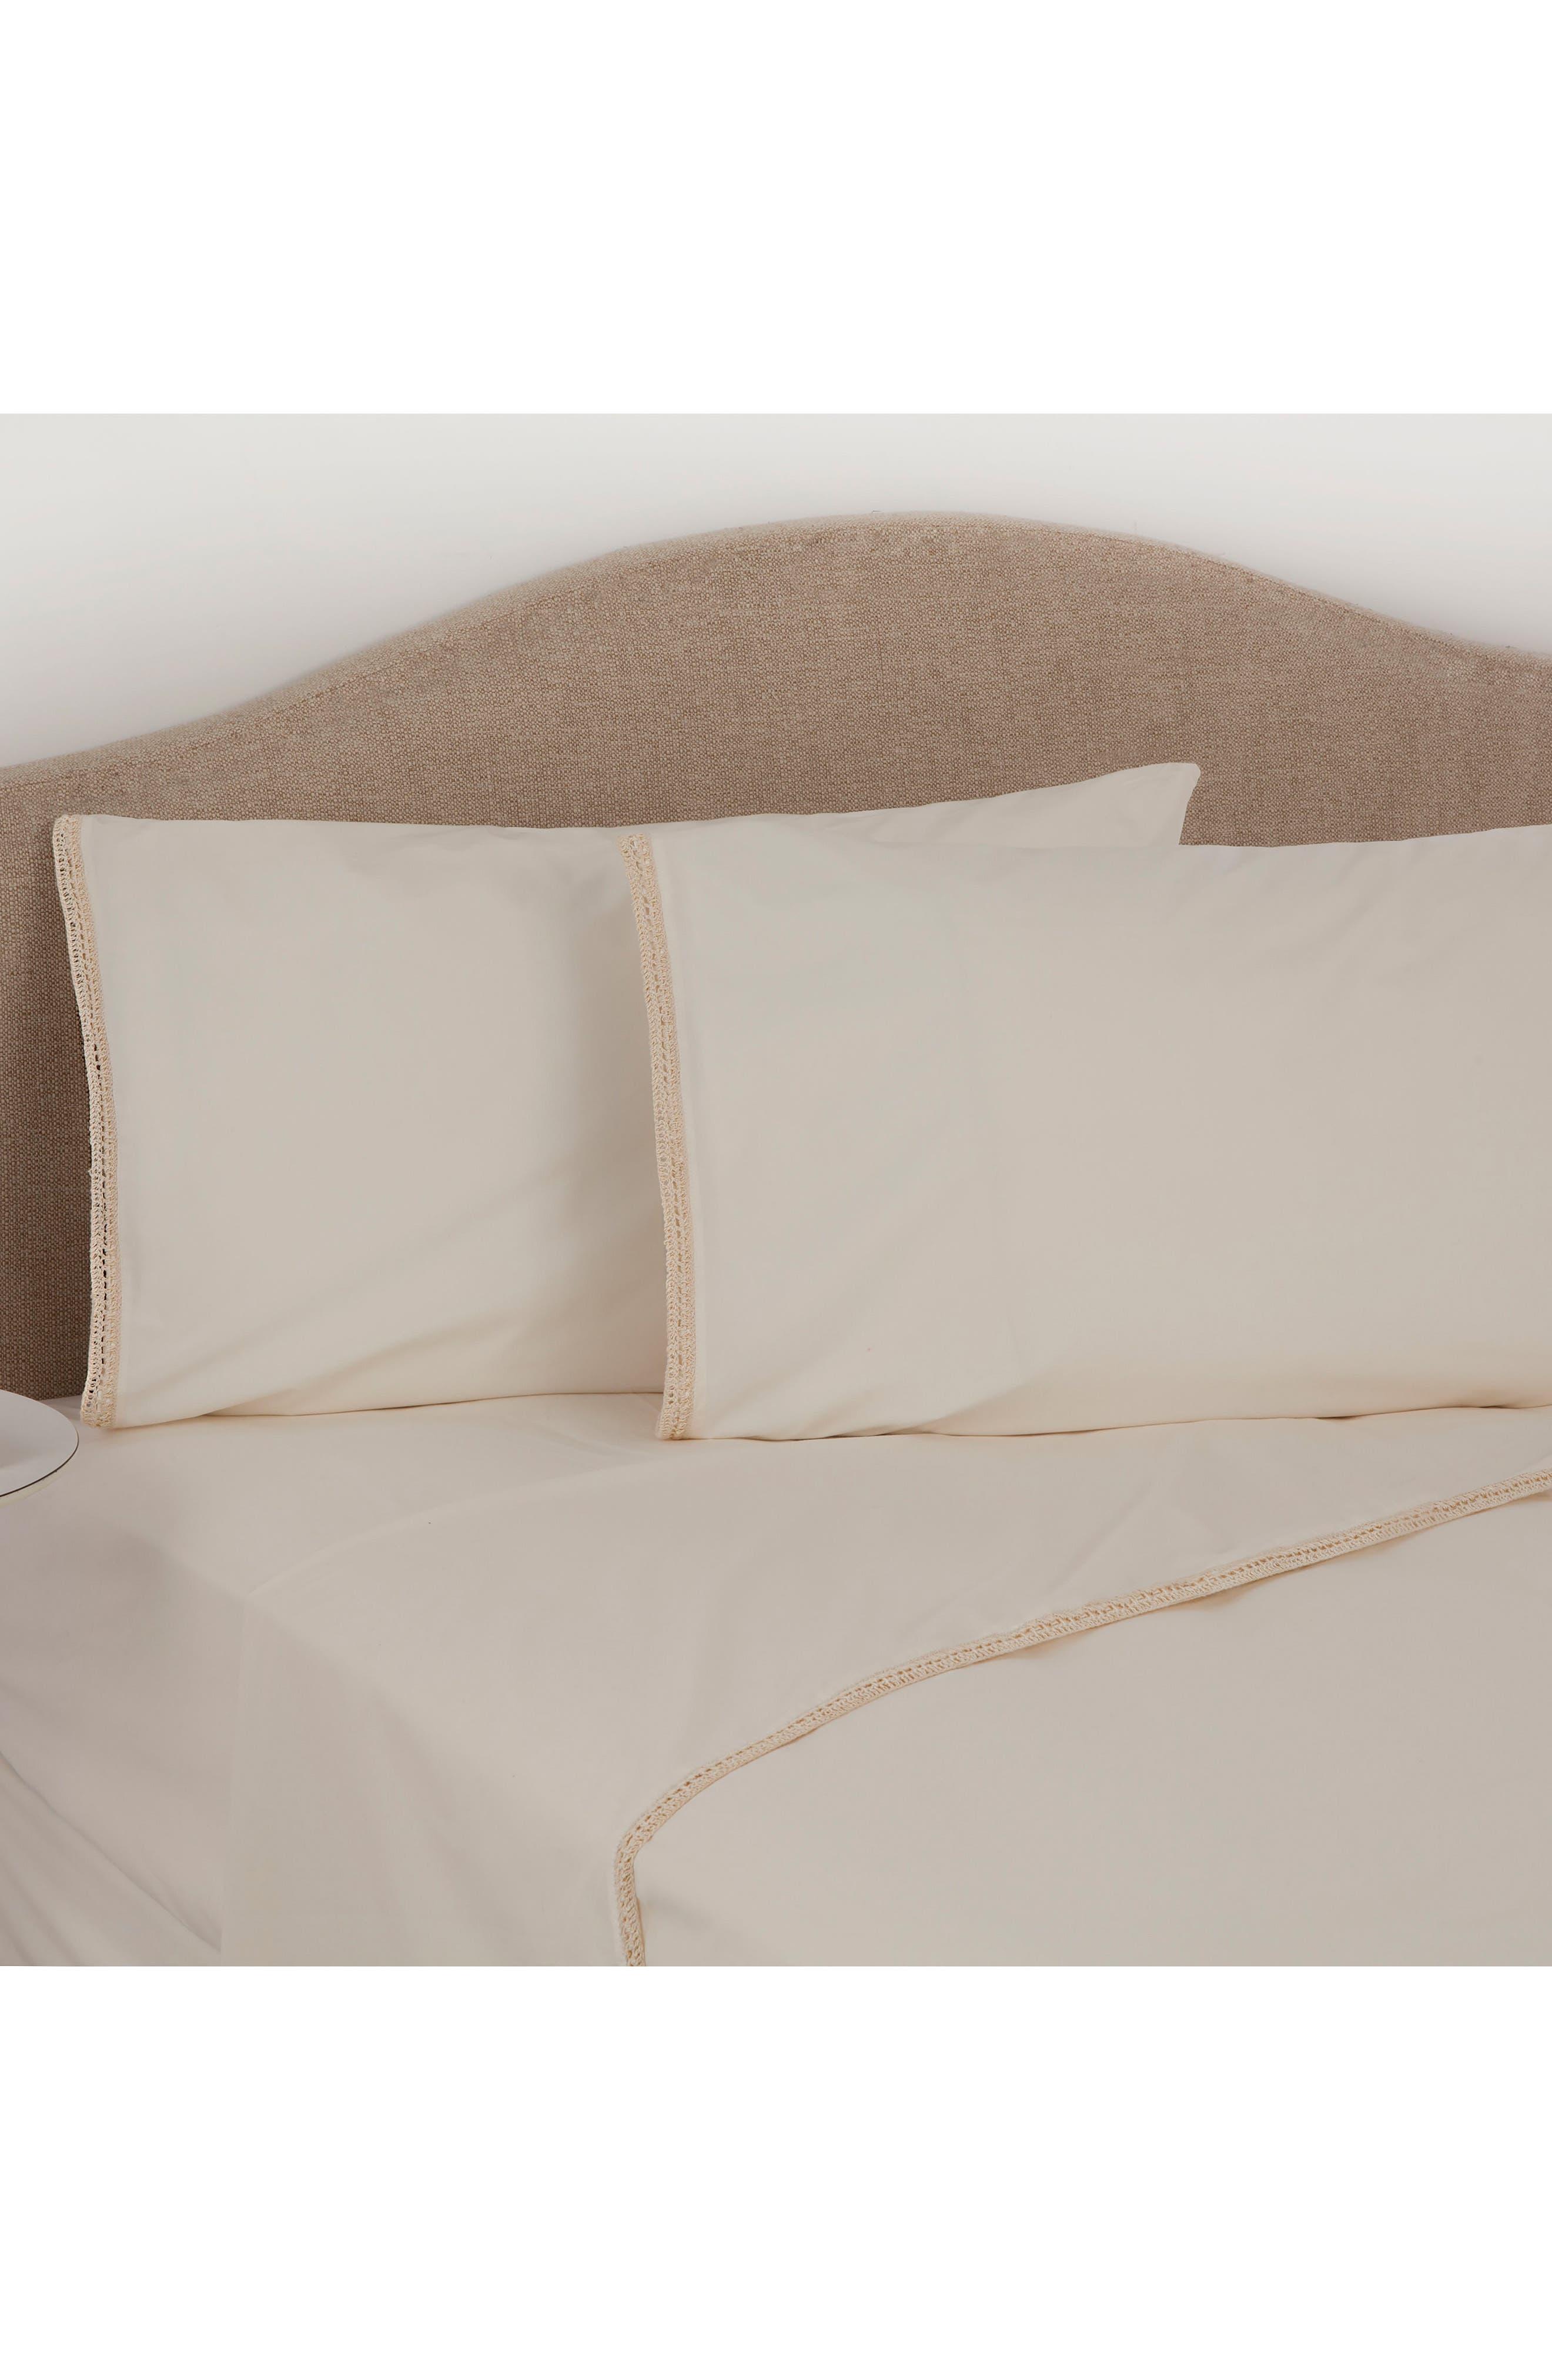 Main Image - Portico Crochet Trim Organic Cotton Flat Sheet